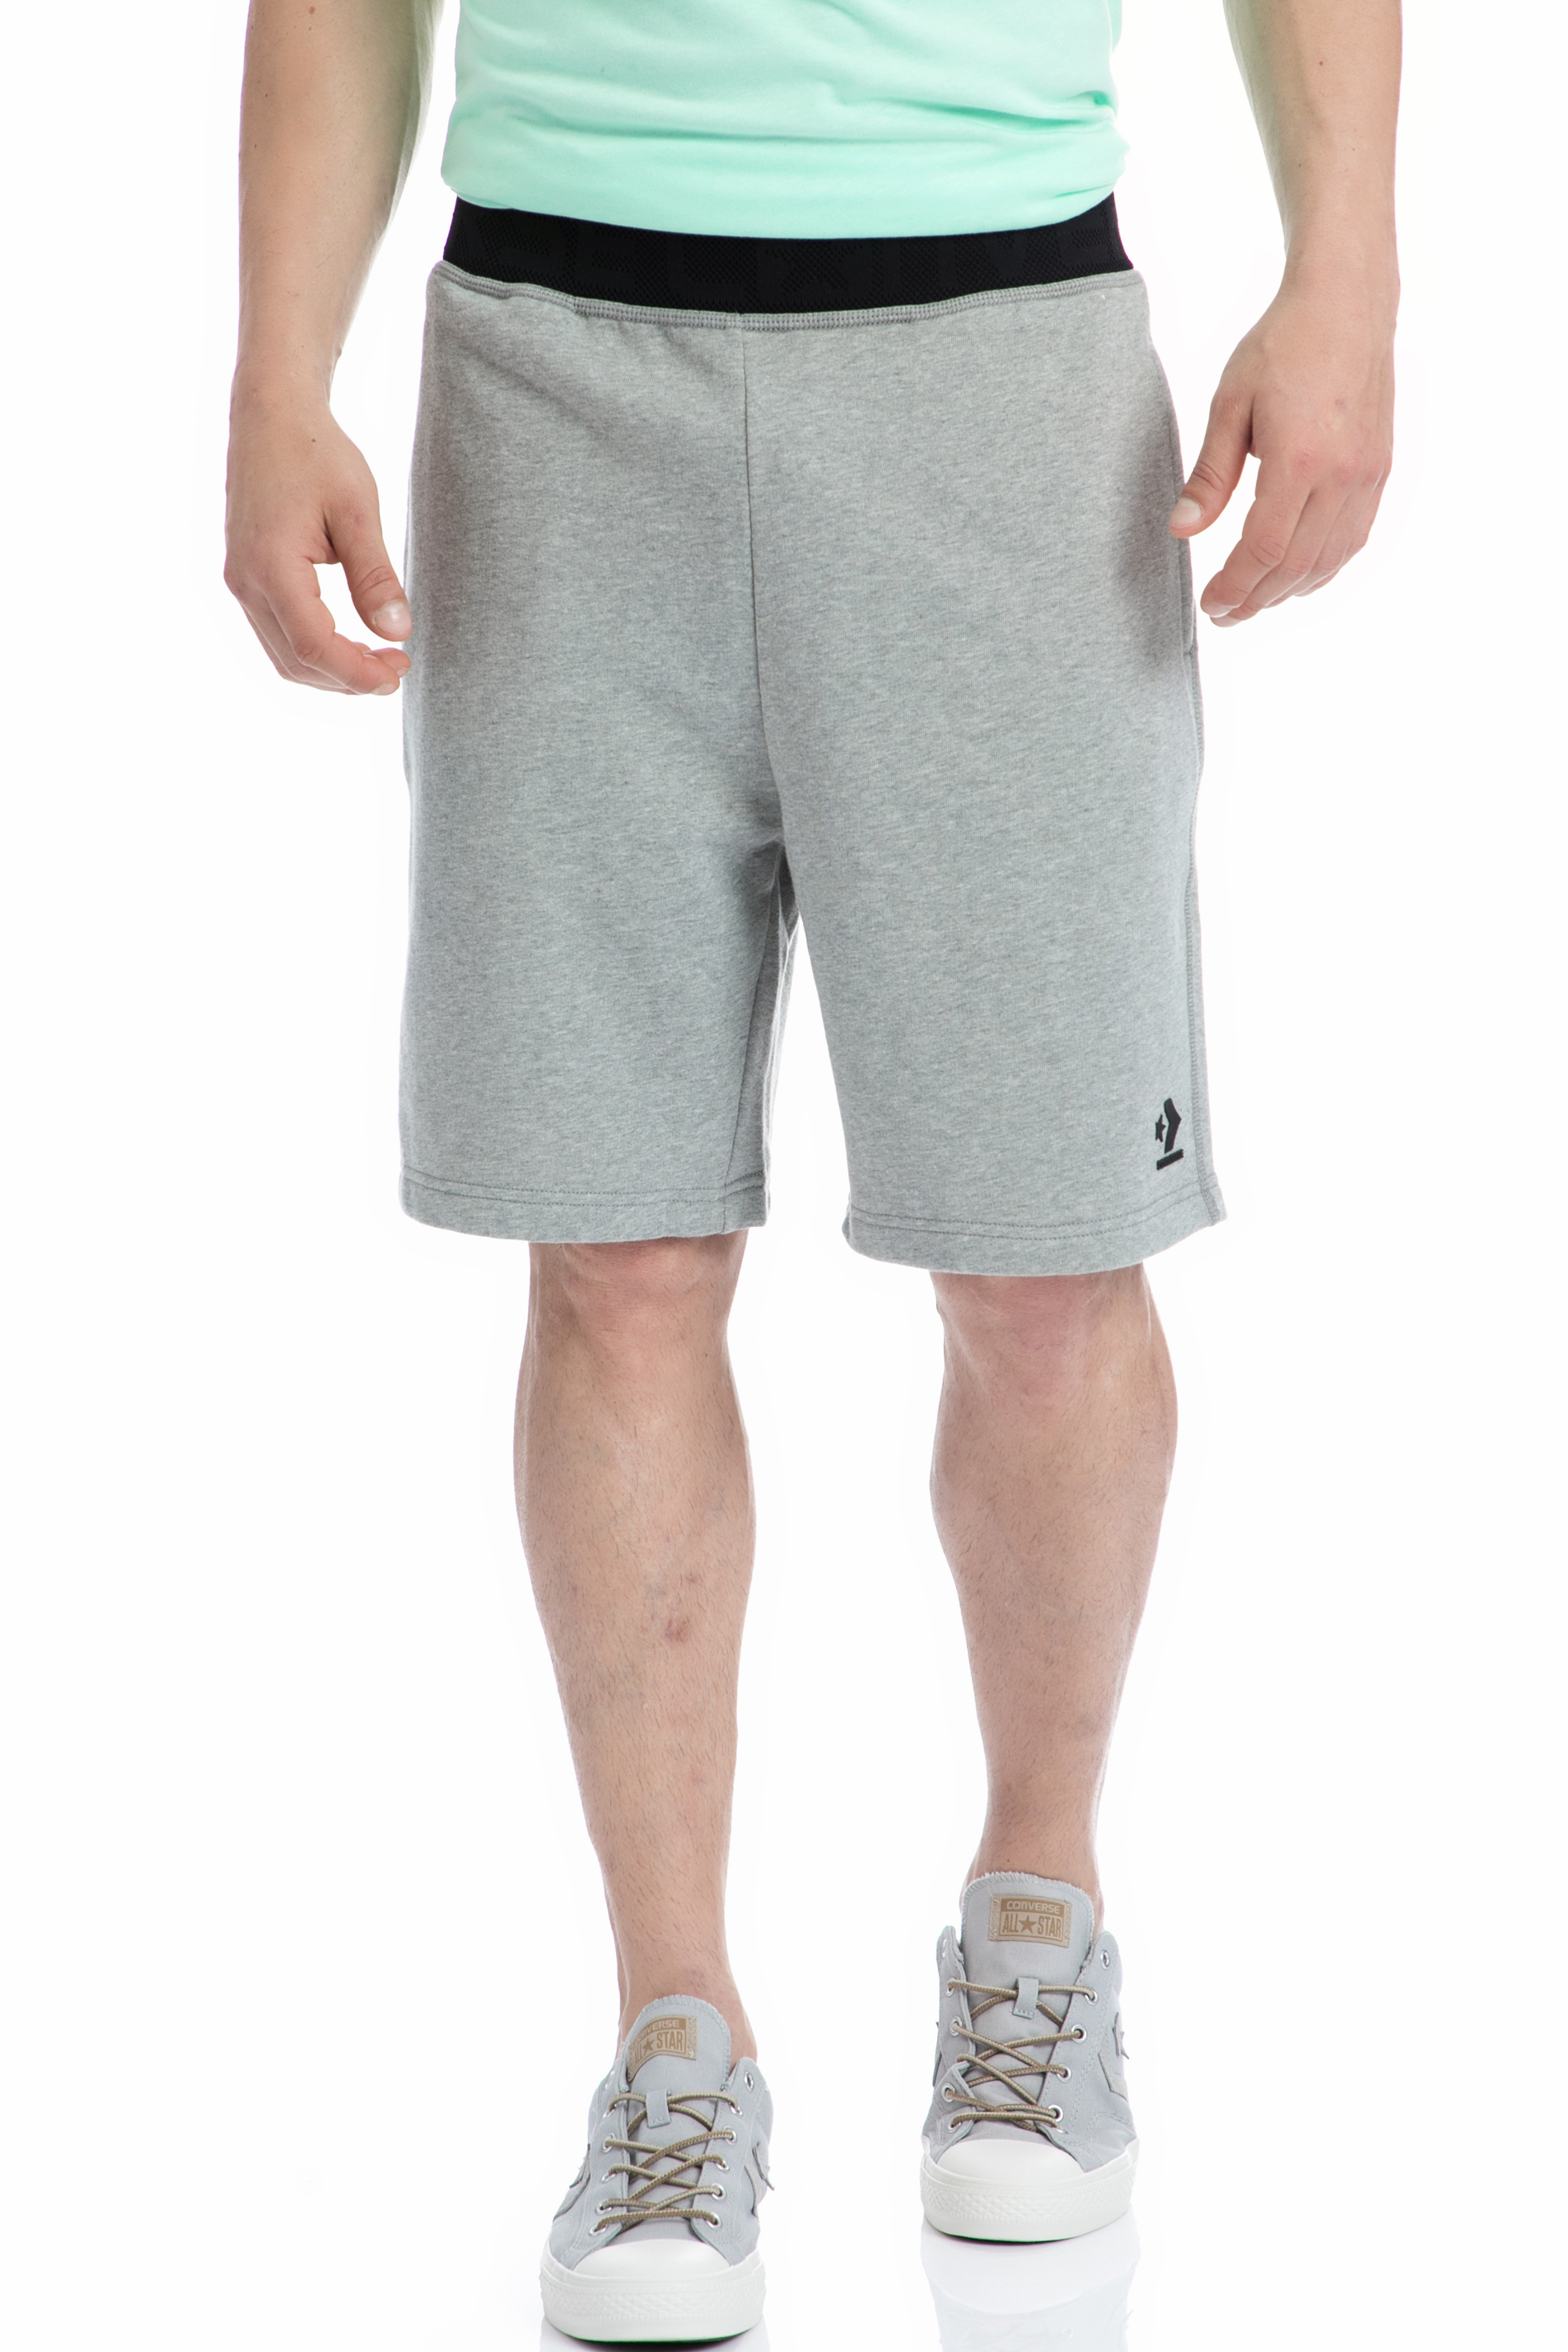 CONVERSE - Ανδρική βερμούδα Converse γκρι ανδρικά ρούχα σορτς βερμούδες αθλητικά